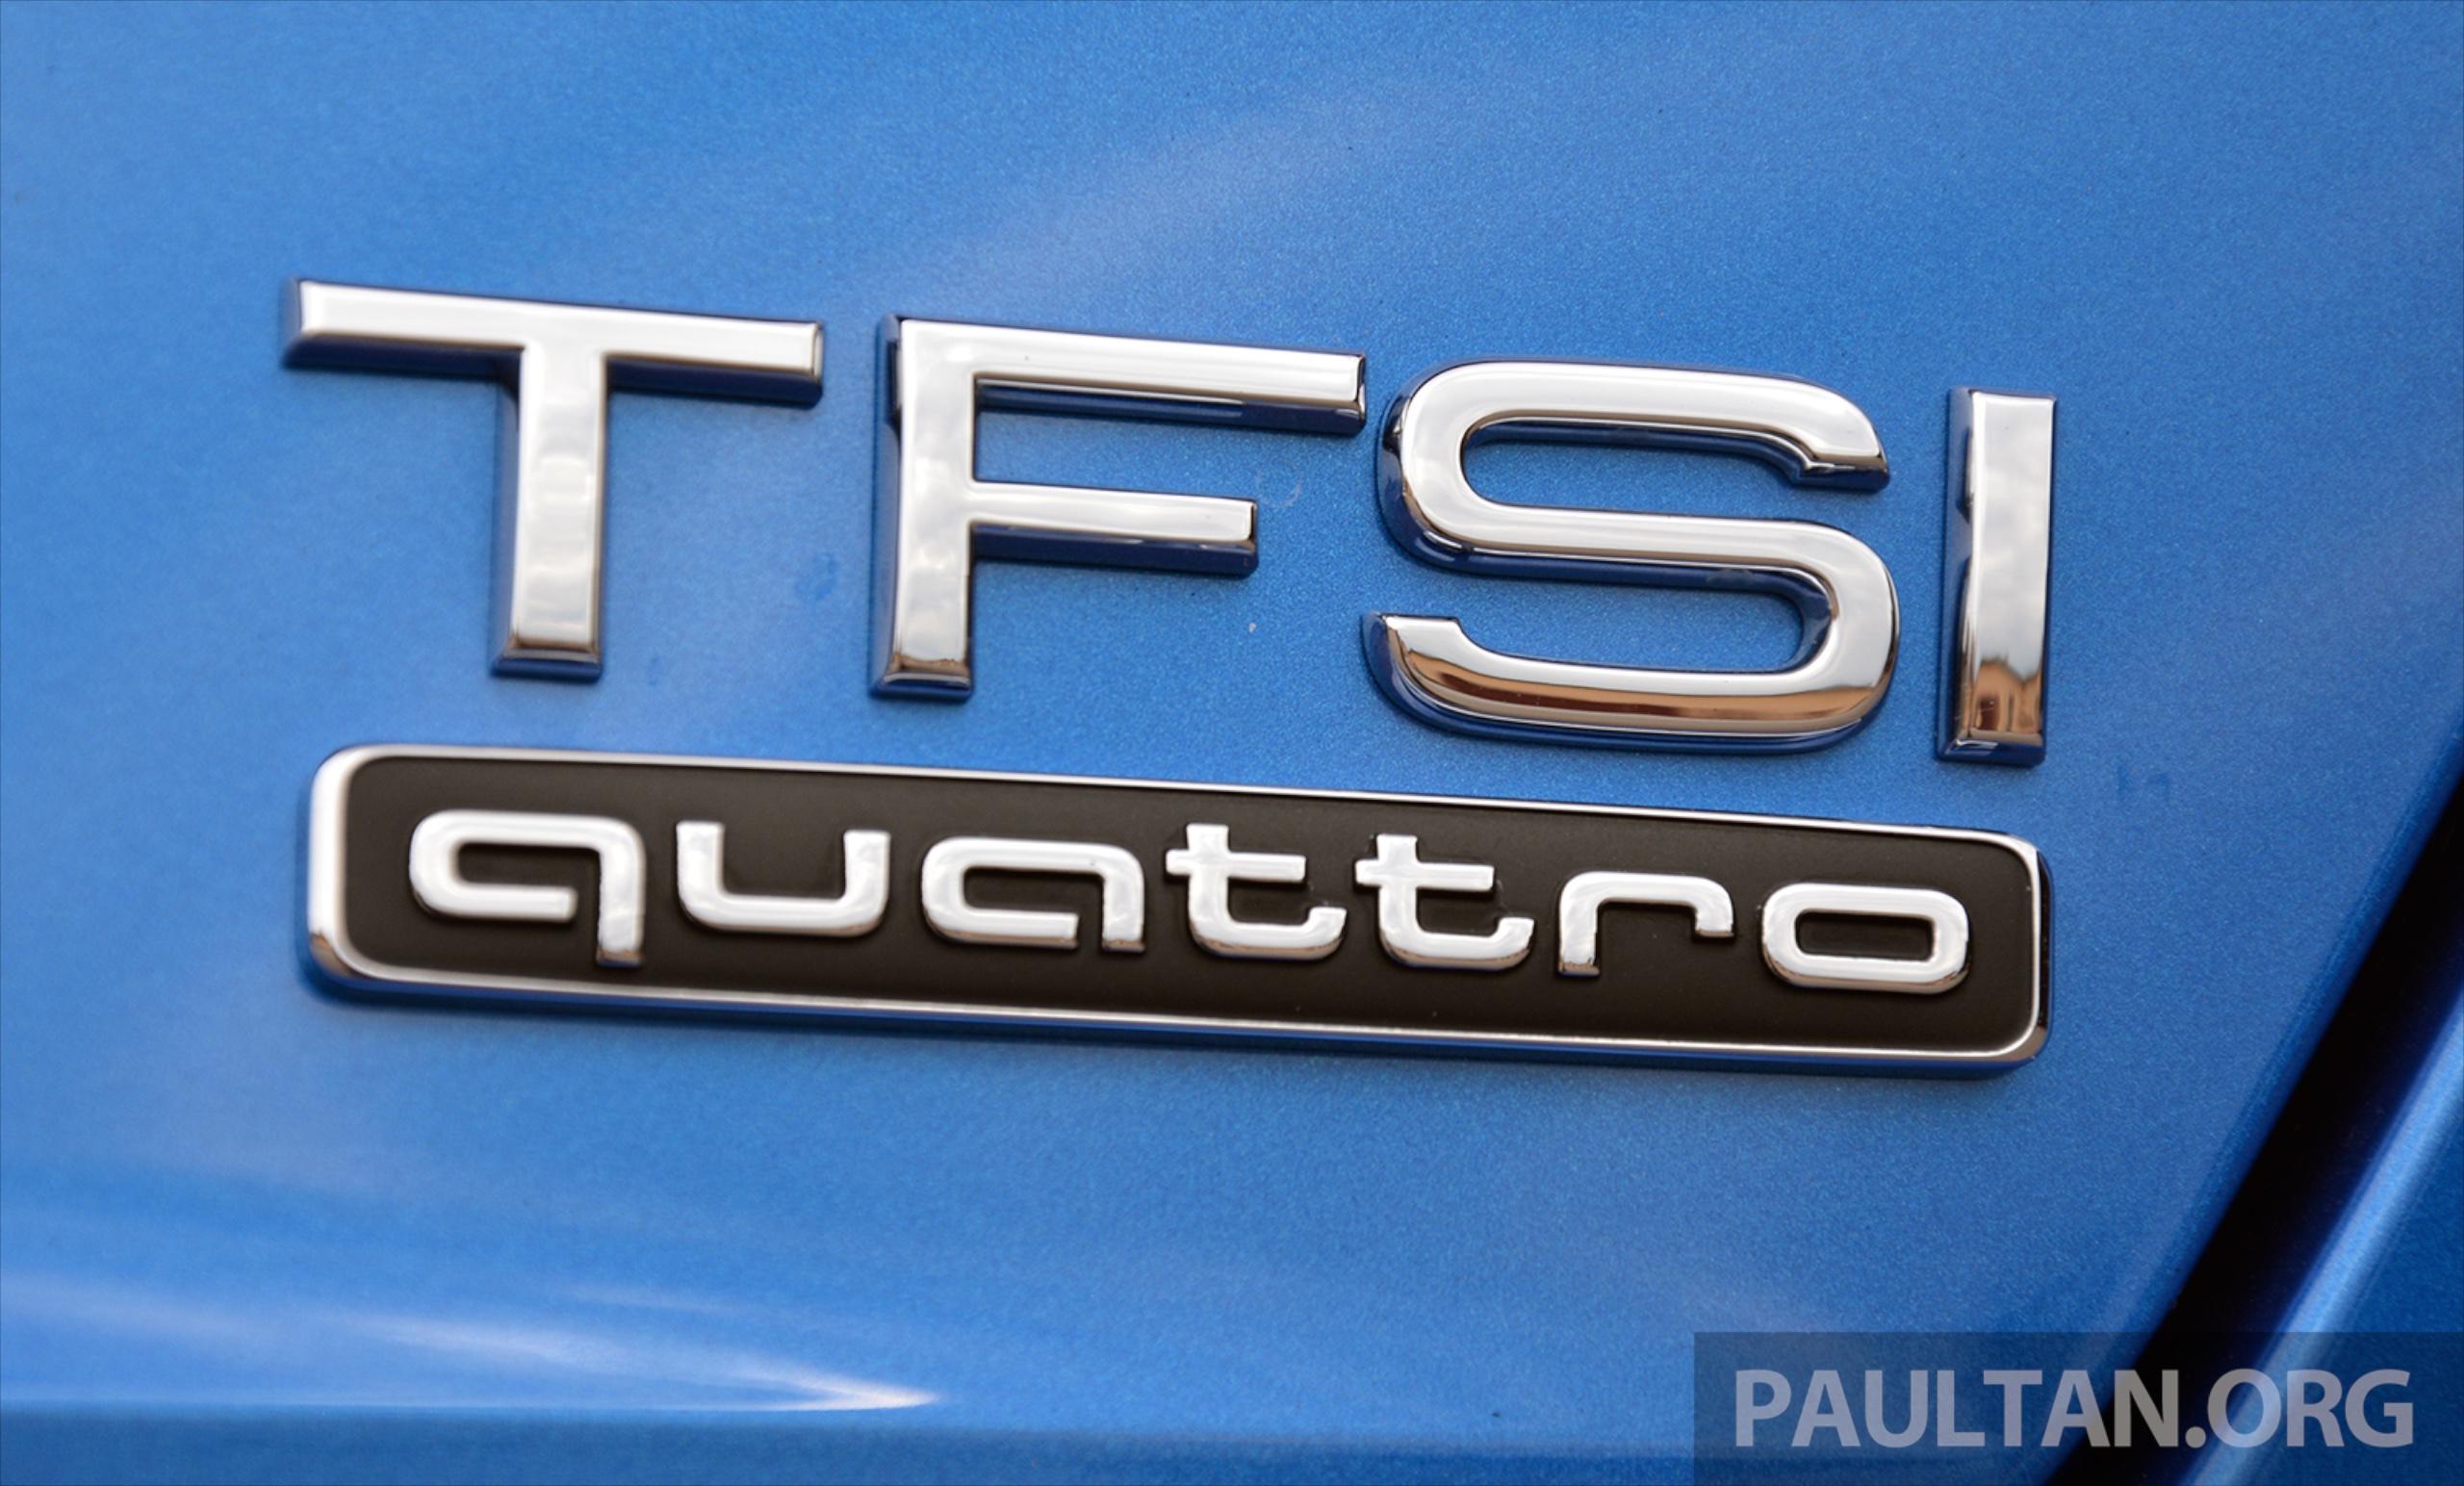 Driven B9 Audi A4 Handsome Suit Inner Beauty Paul Tan